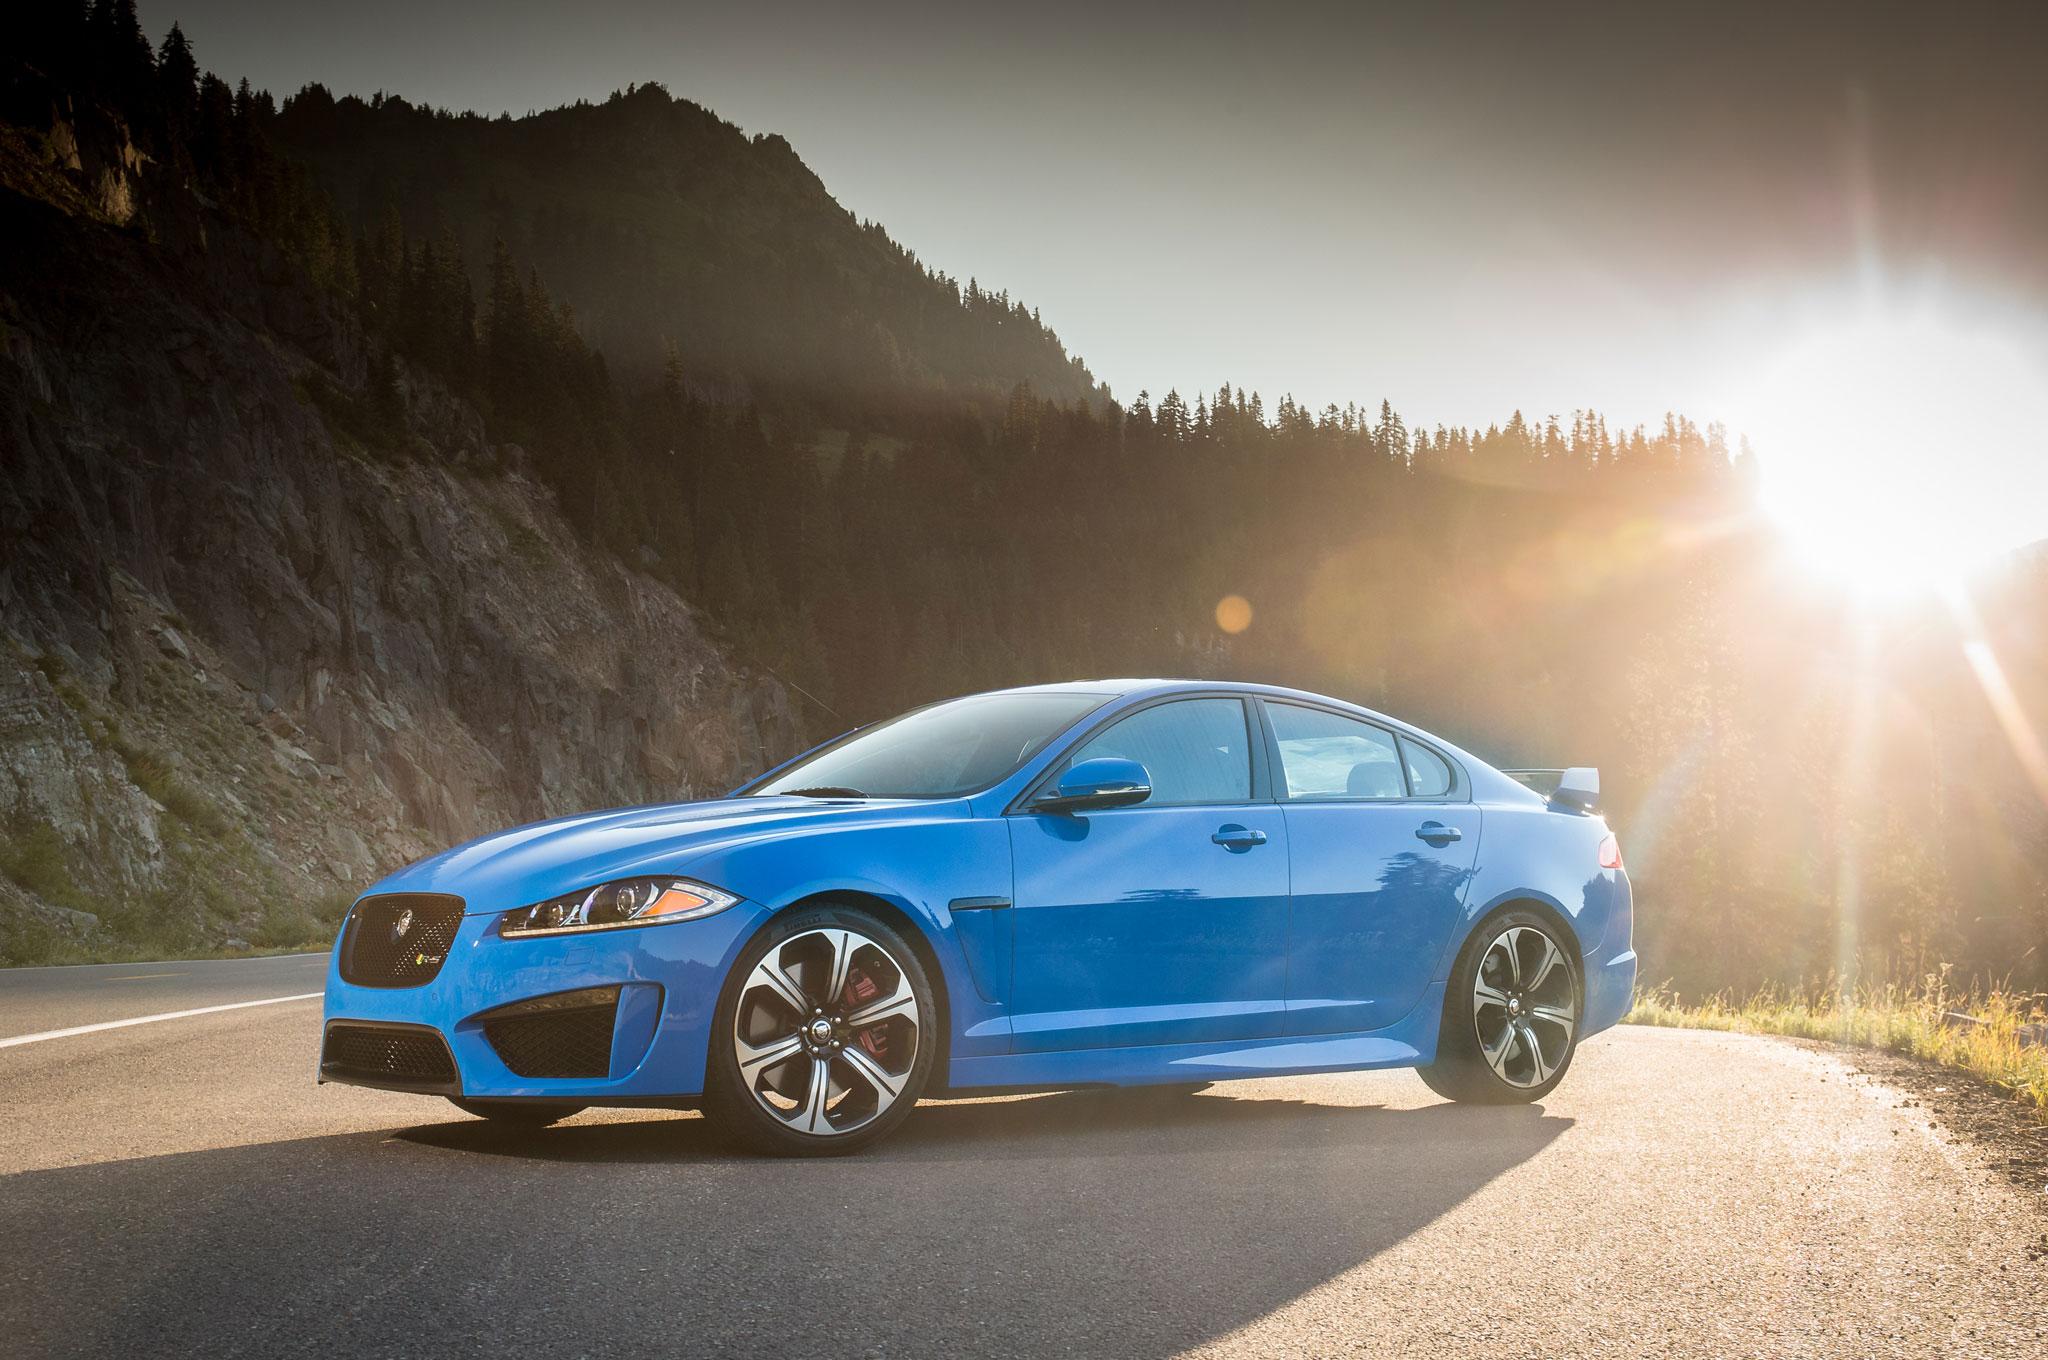 First Look: 2014 Jaguar XFR-S - Automobile Magazine